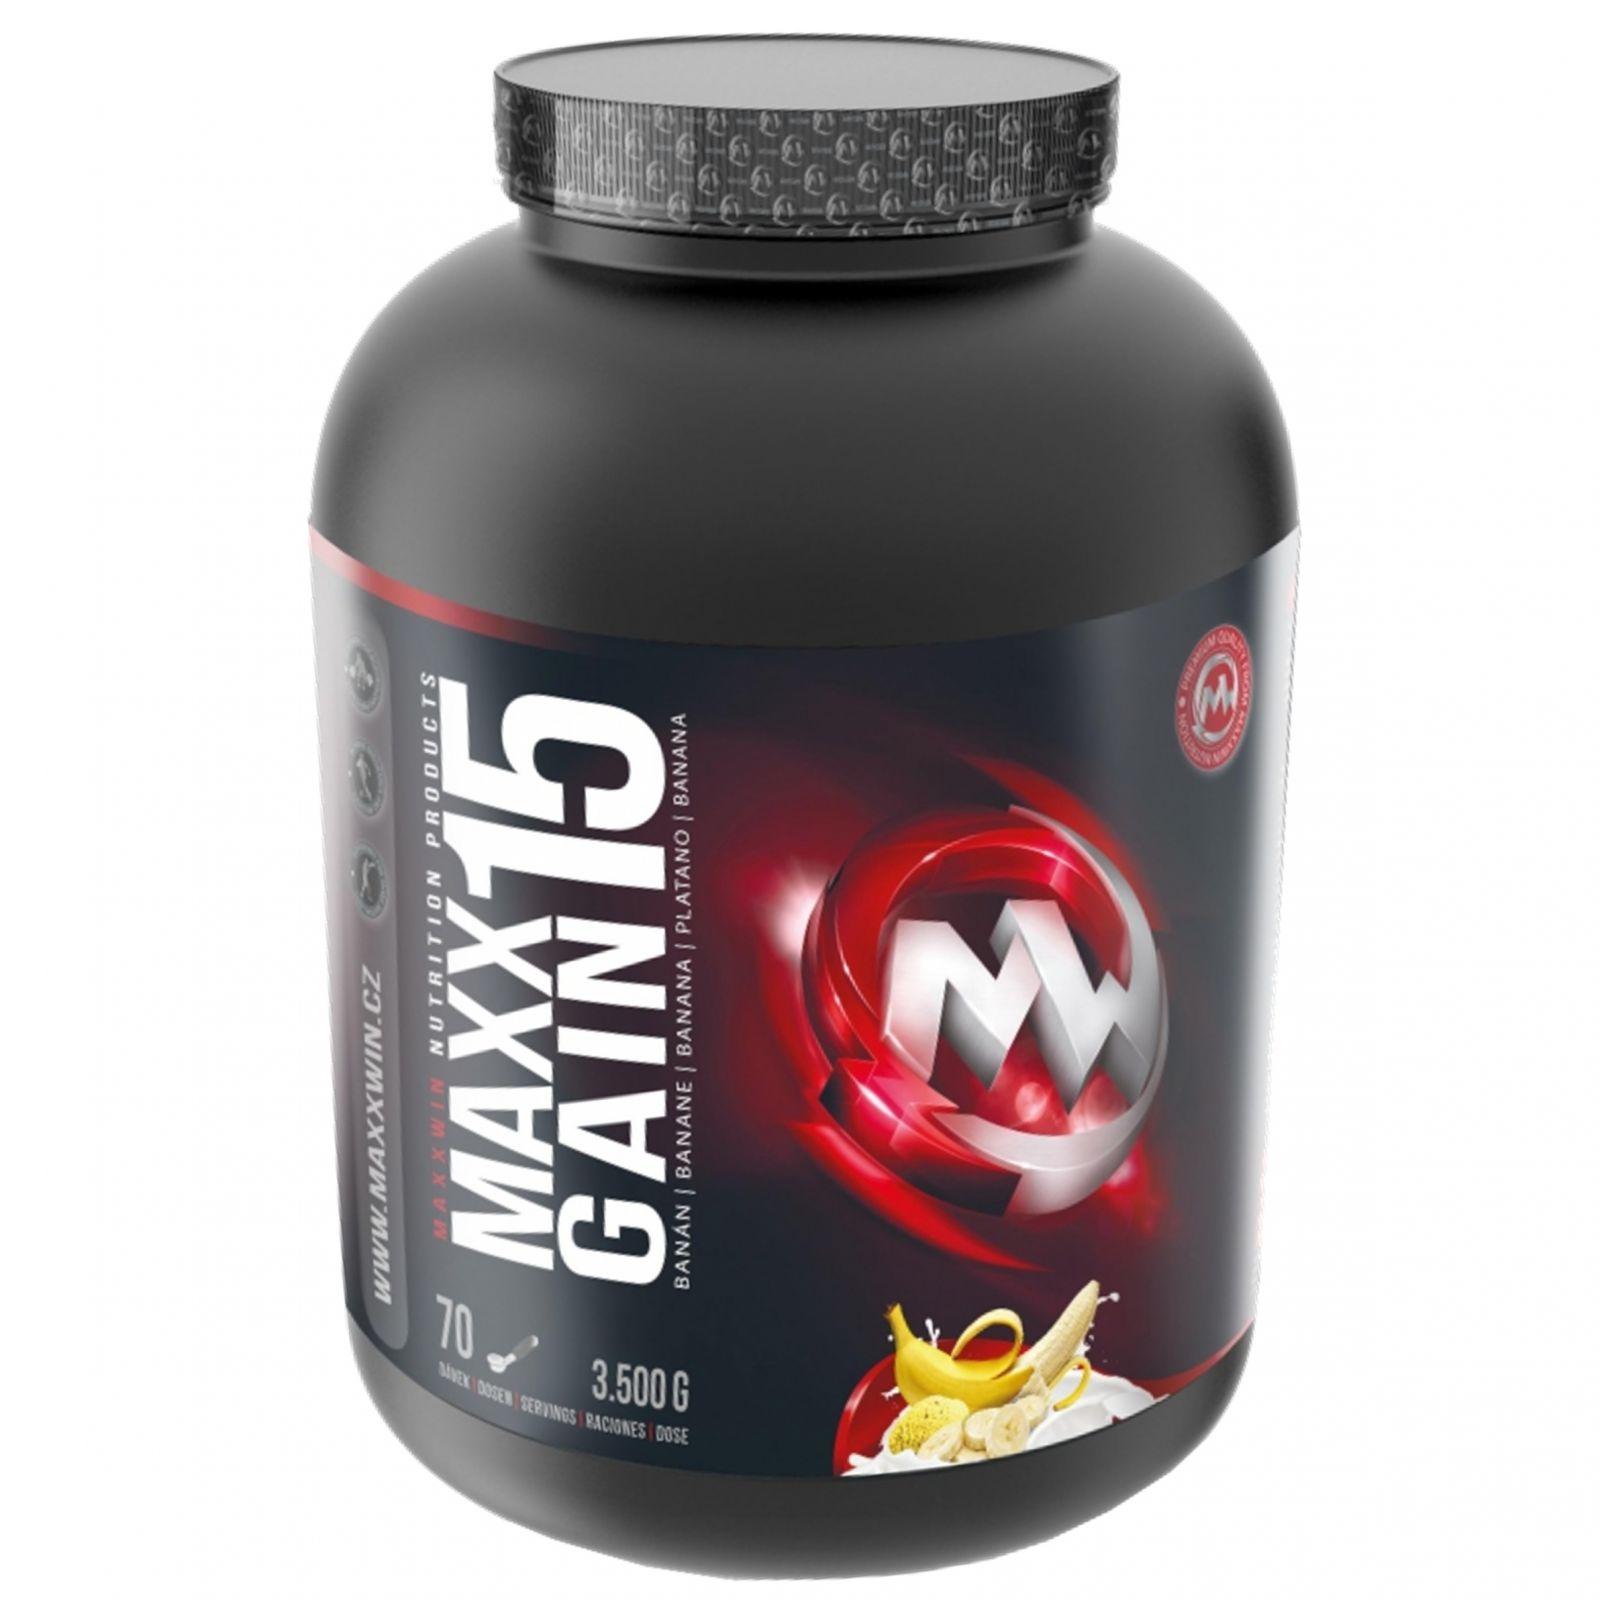 MAXXWIN MAXX GAIN 15 - 3500 g